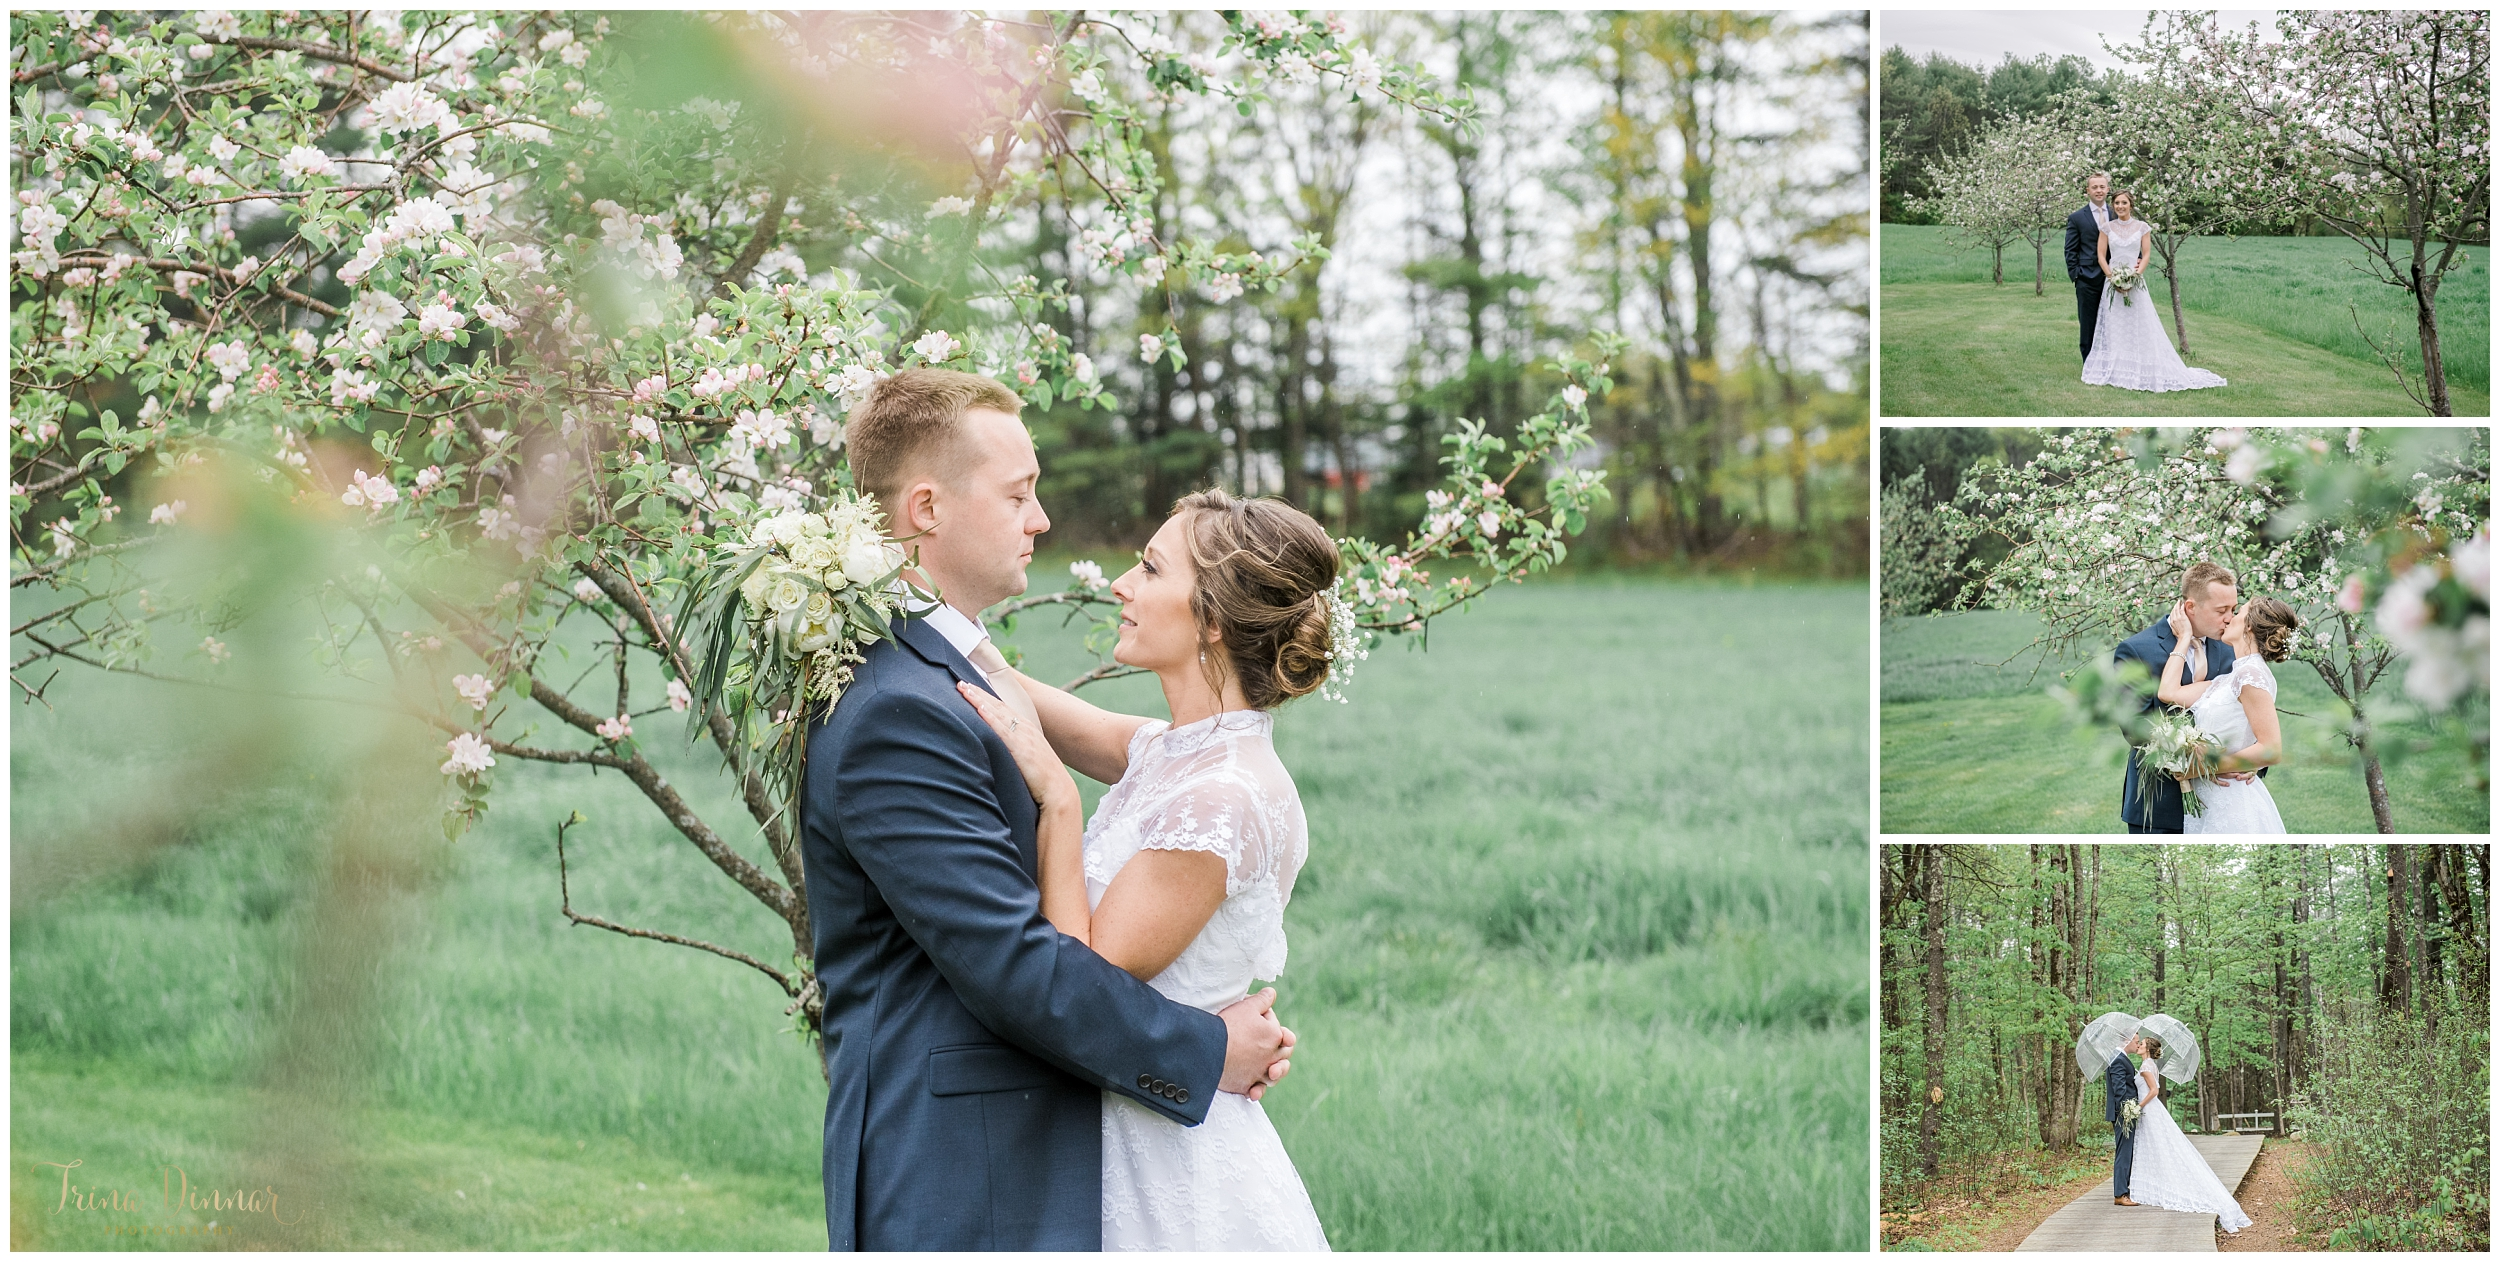 Maine Spring Wedding Photography by Trina Dinnar